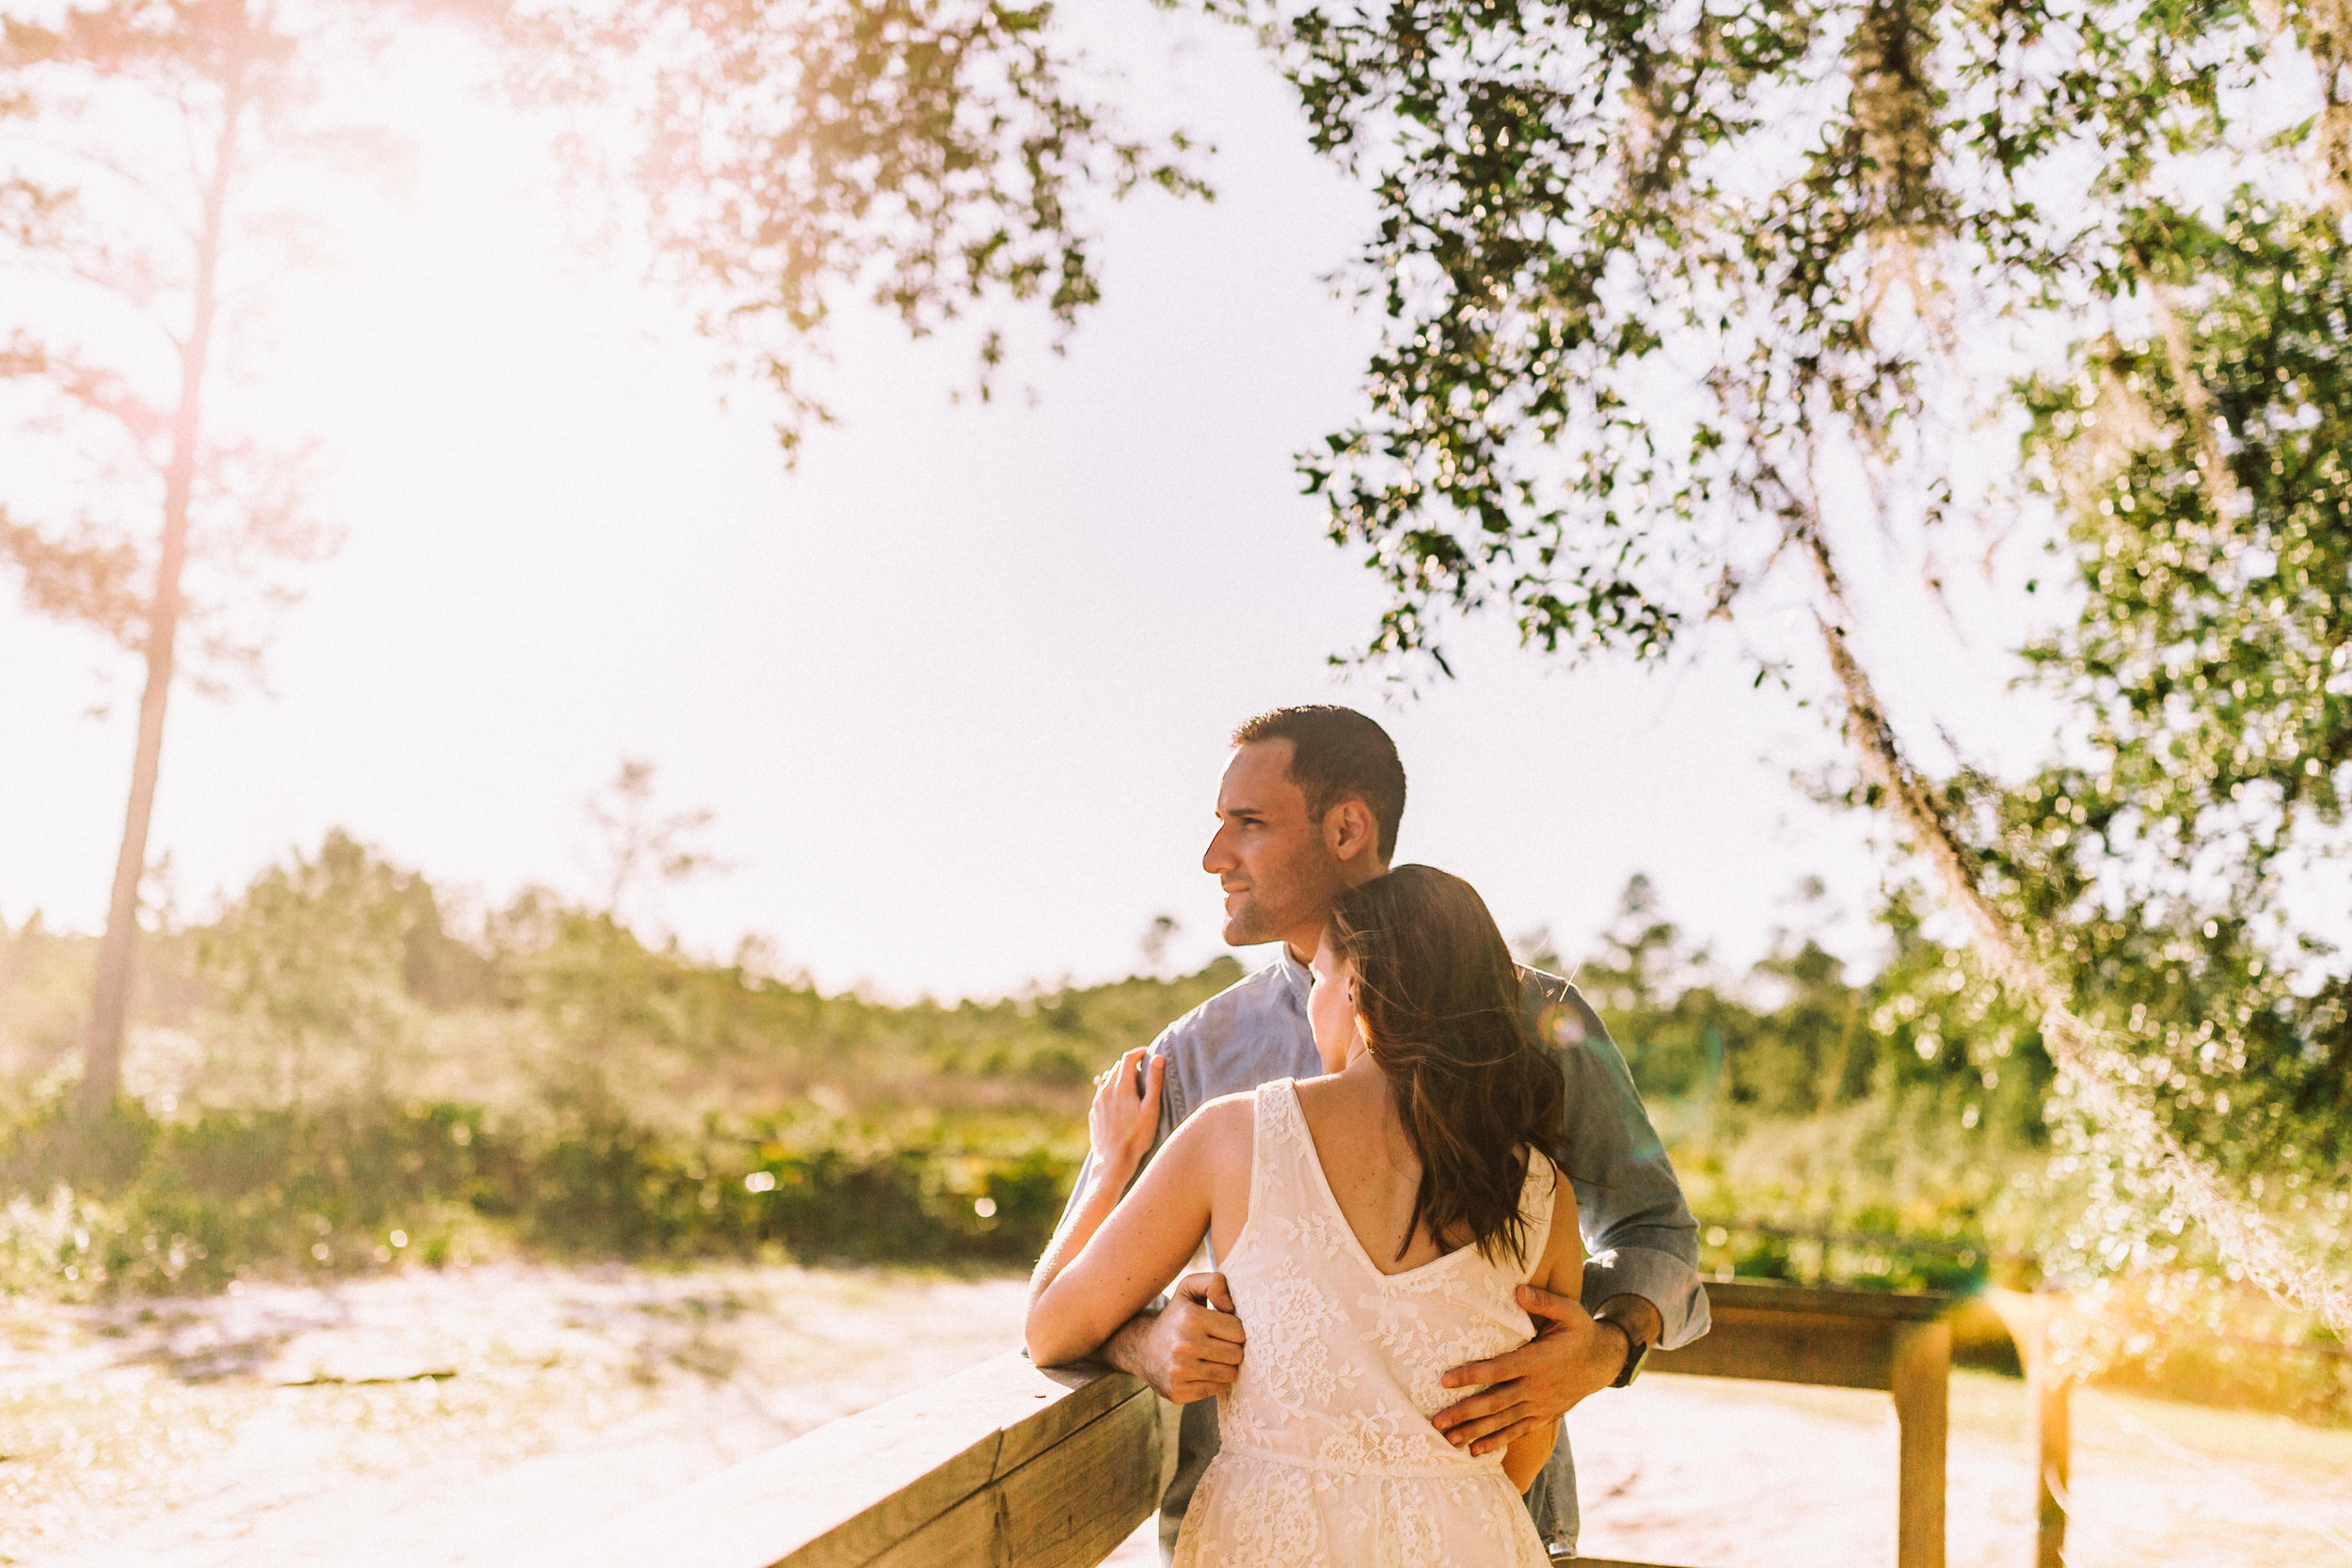 Orlando Engagement session at Wekiva Springs State Park nature-Anthony + Christine 4.jpg